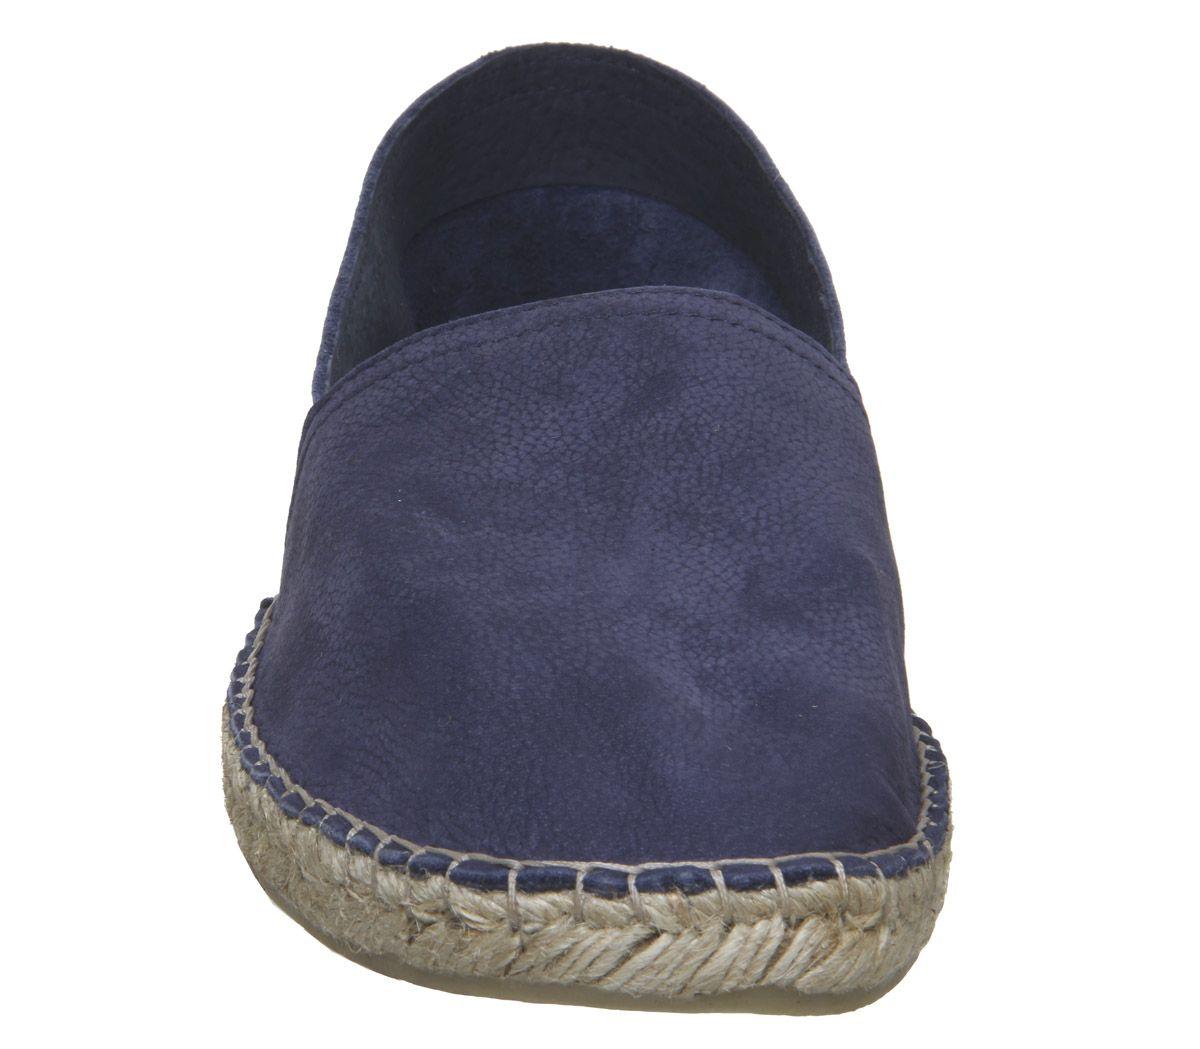 Mens-Office-Luca-Espadrilles-Navy-Nubuck-Casual-Shoes thumbnail 3